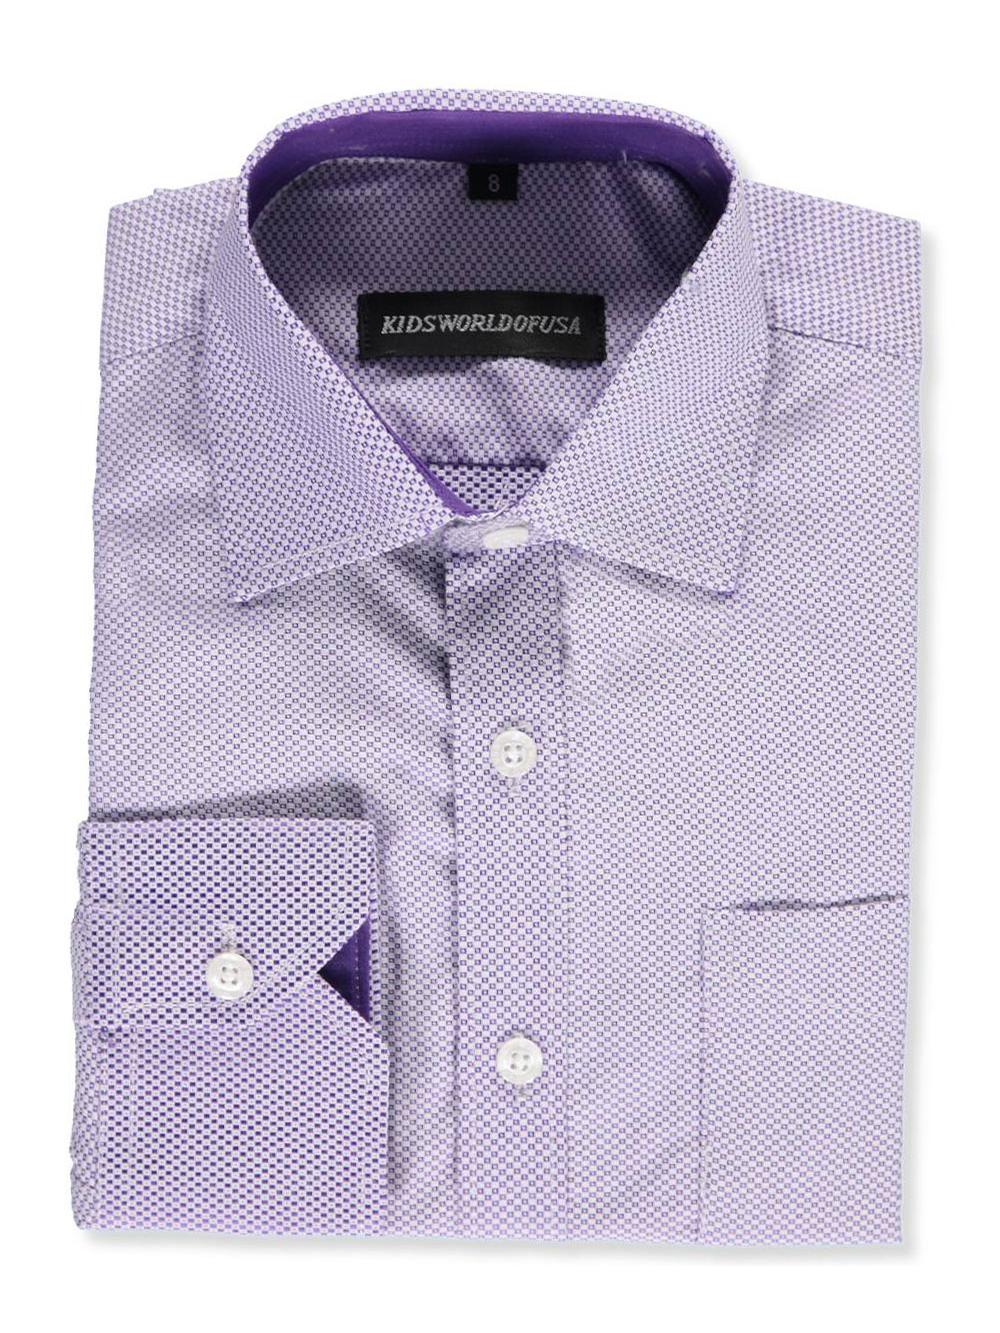 b6e56380c Kids World Big Boys  Dress Shirt (Sizes 8 – 20)